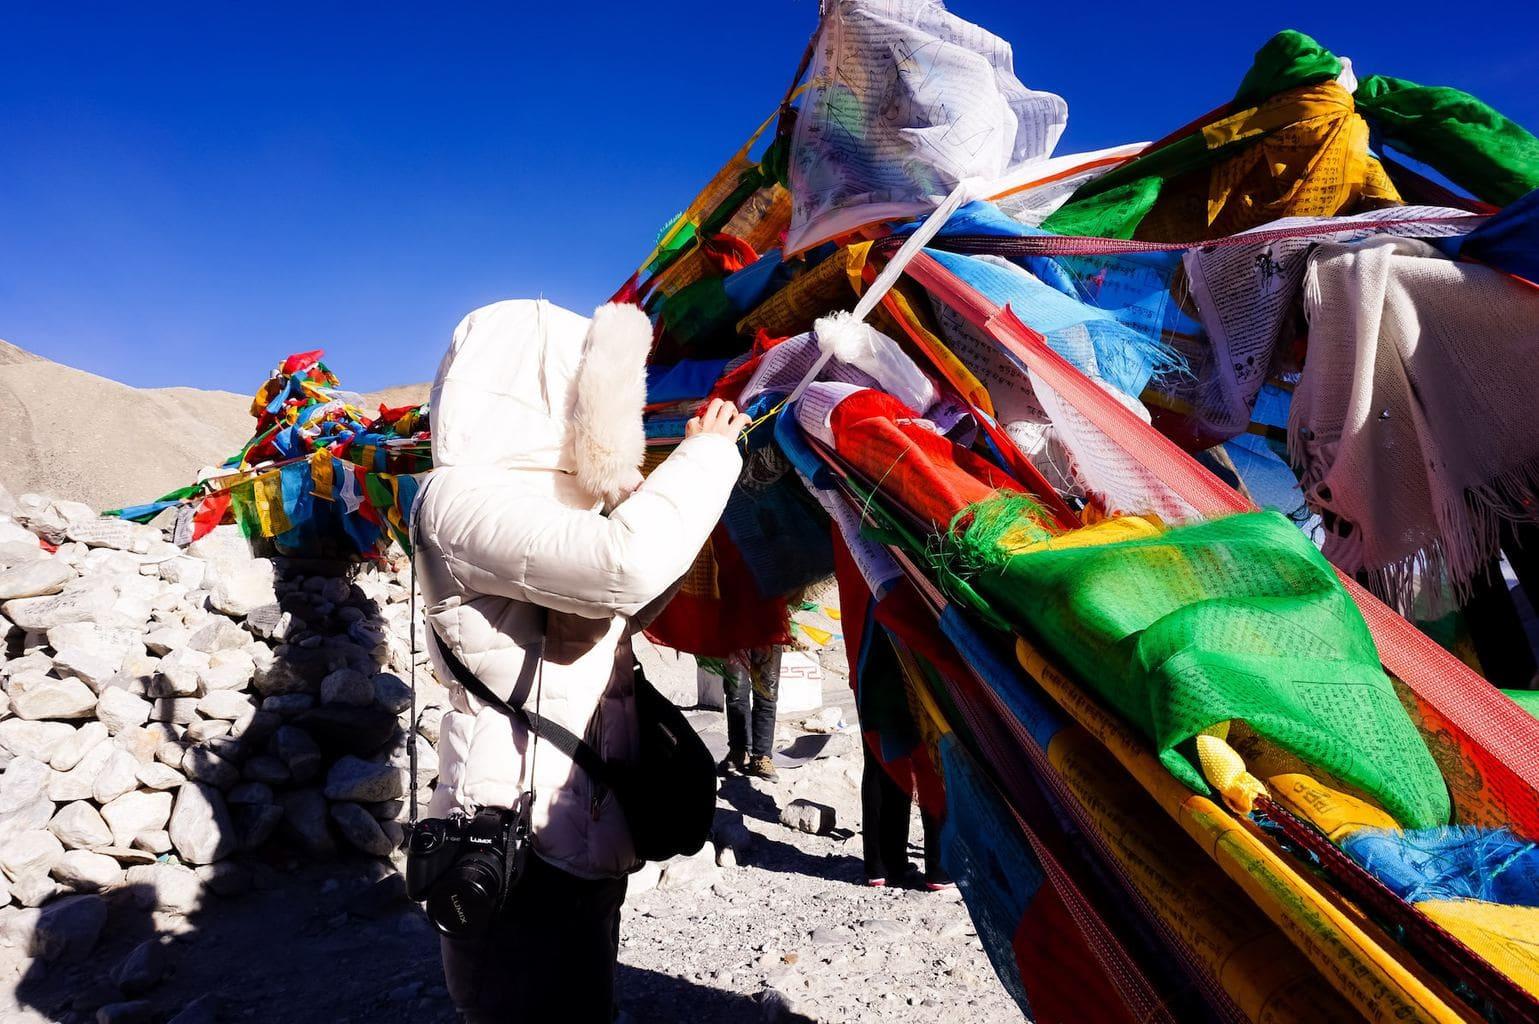 Reaching Everest base camp